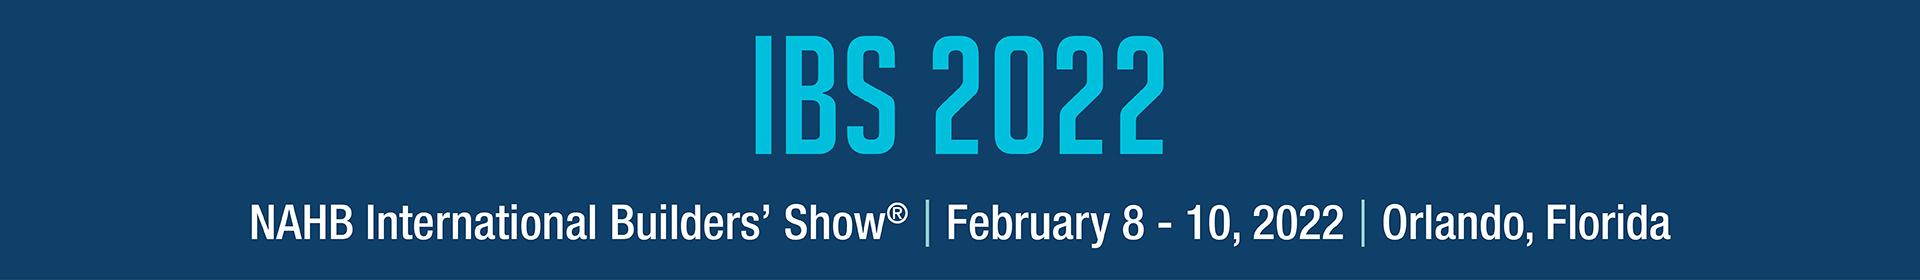 2022 International Builders' Show Event Banner